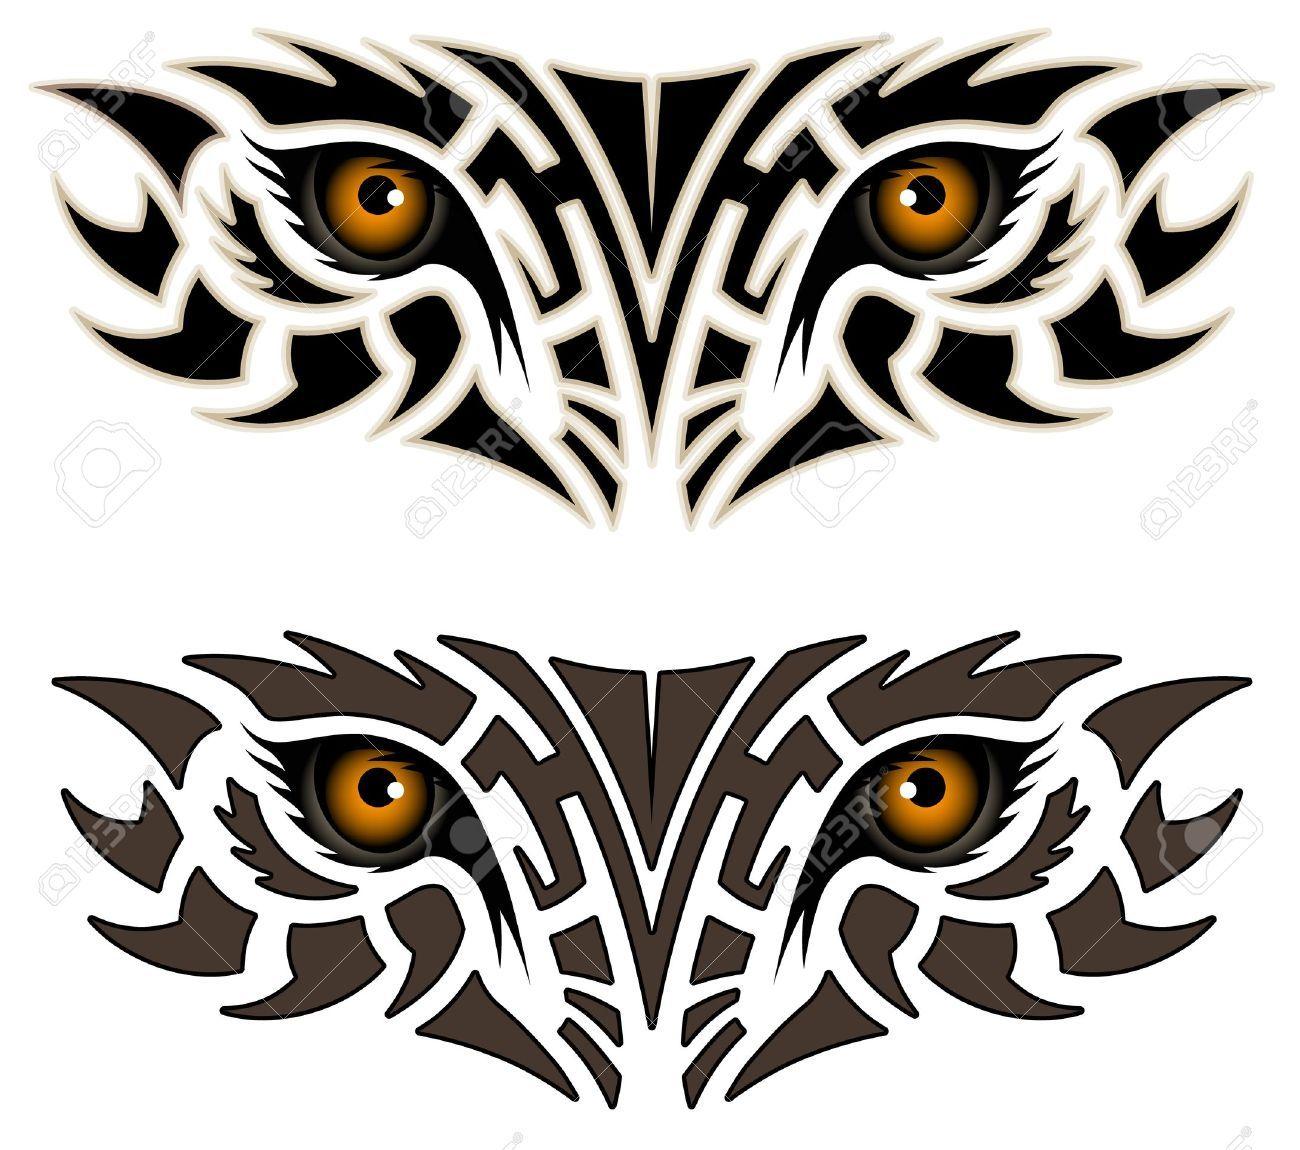 Wildcat cliparts stock vector and royalty free wildcat